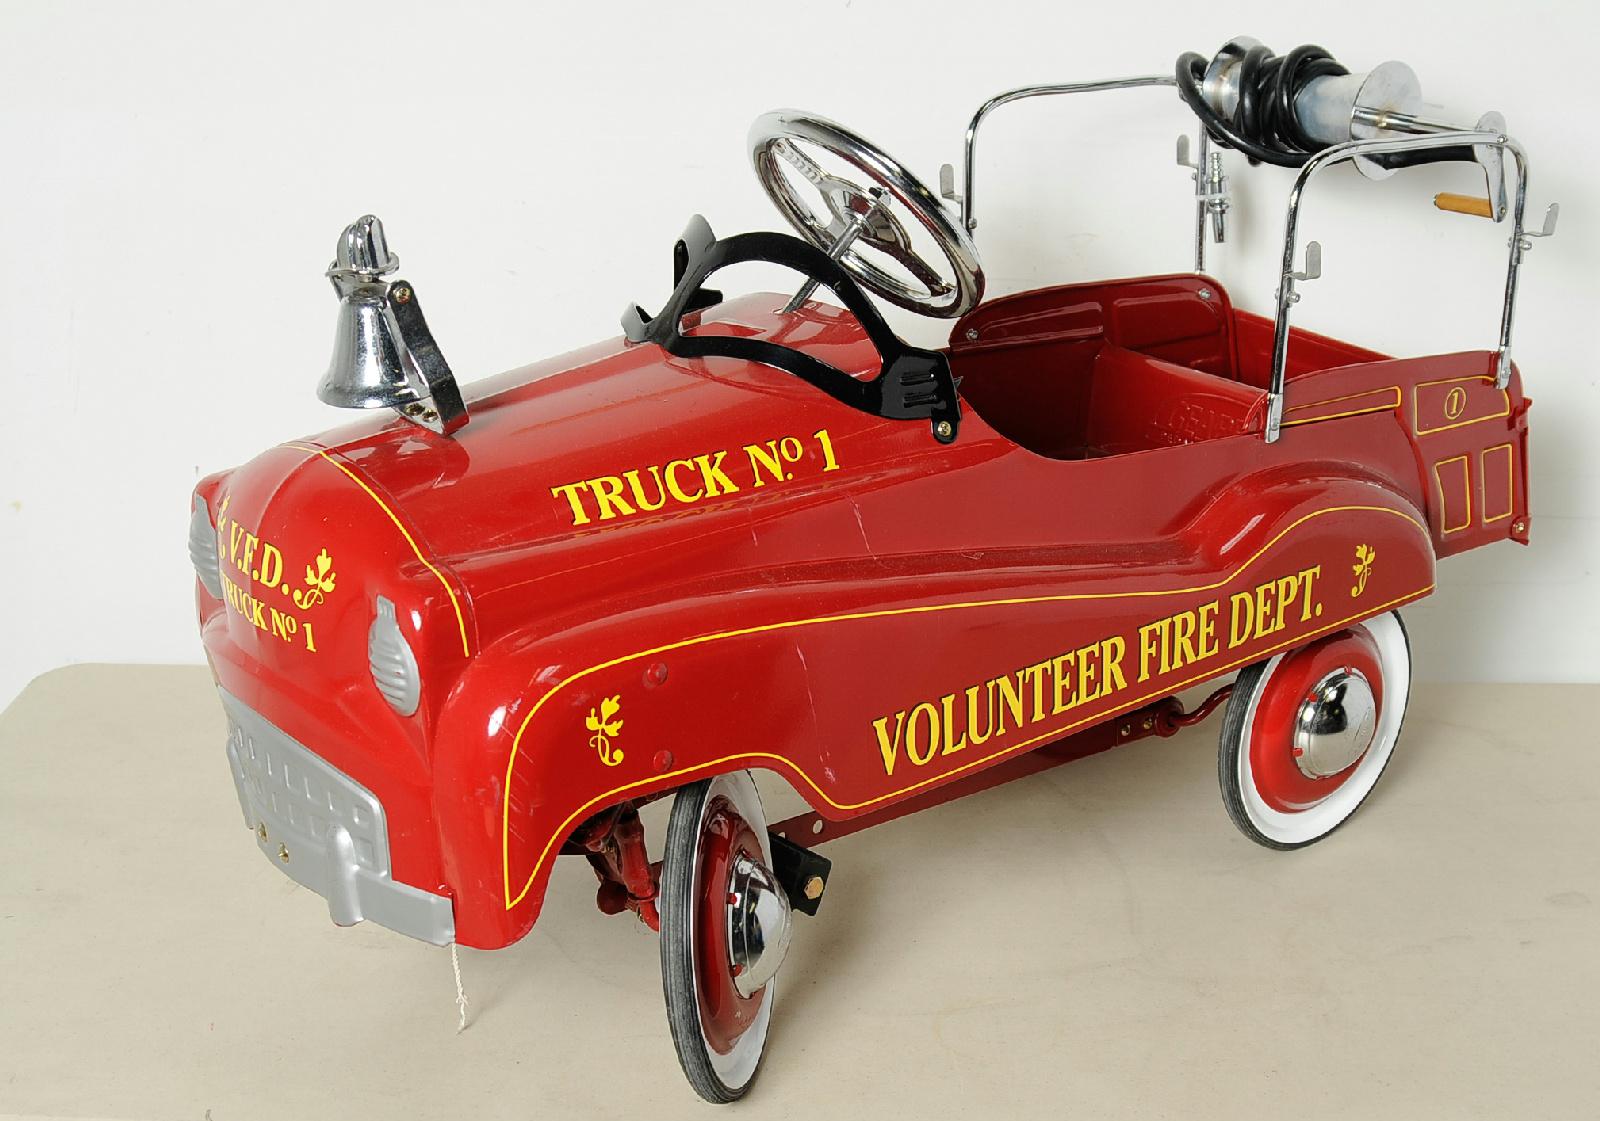 Fire Truck Pedal Car: Gearbox Red Pedal Car Fire Truck Volunteer Fire Department